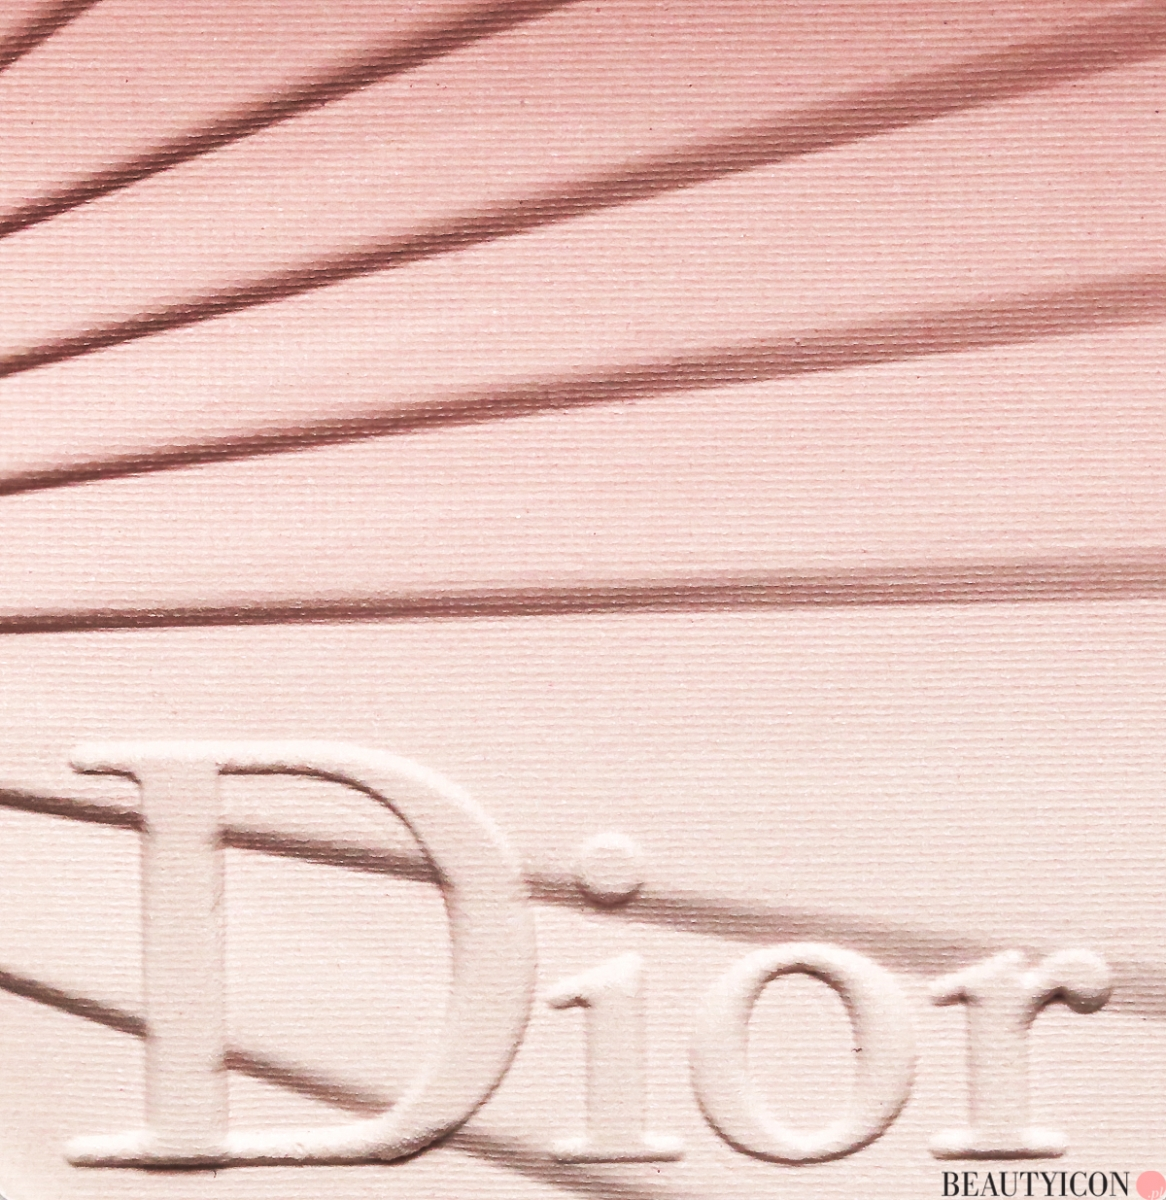 Dior Colour Gradation 2017, Dior Wiosna Makijaż, Diorskin Nude Air Rising Pink